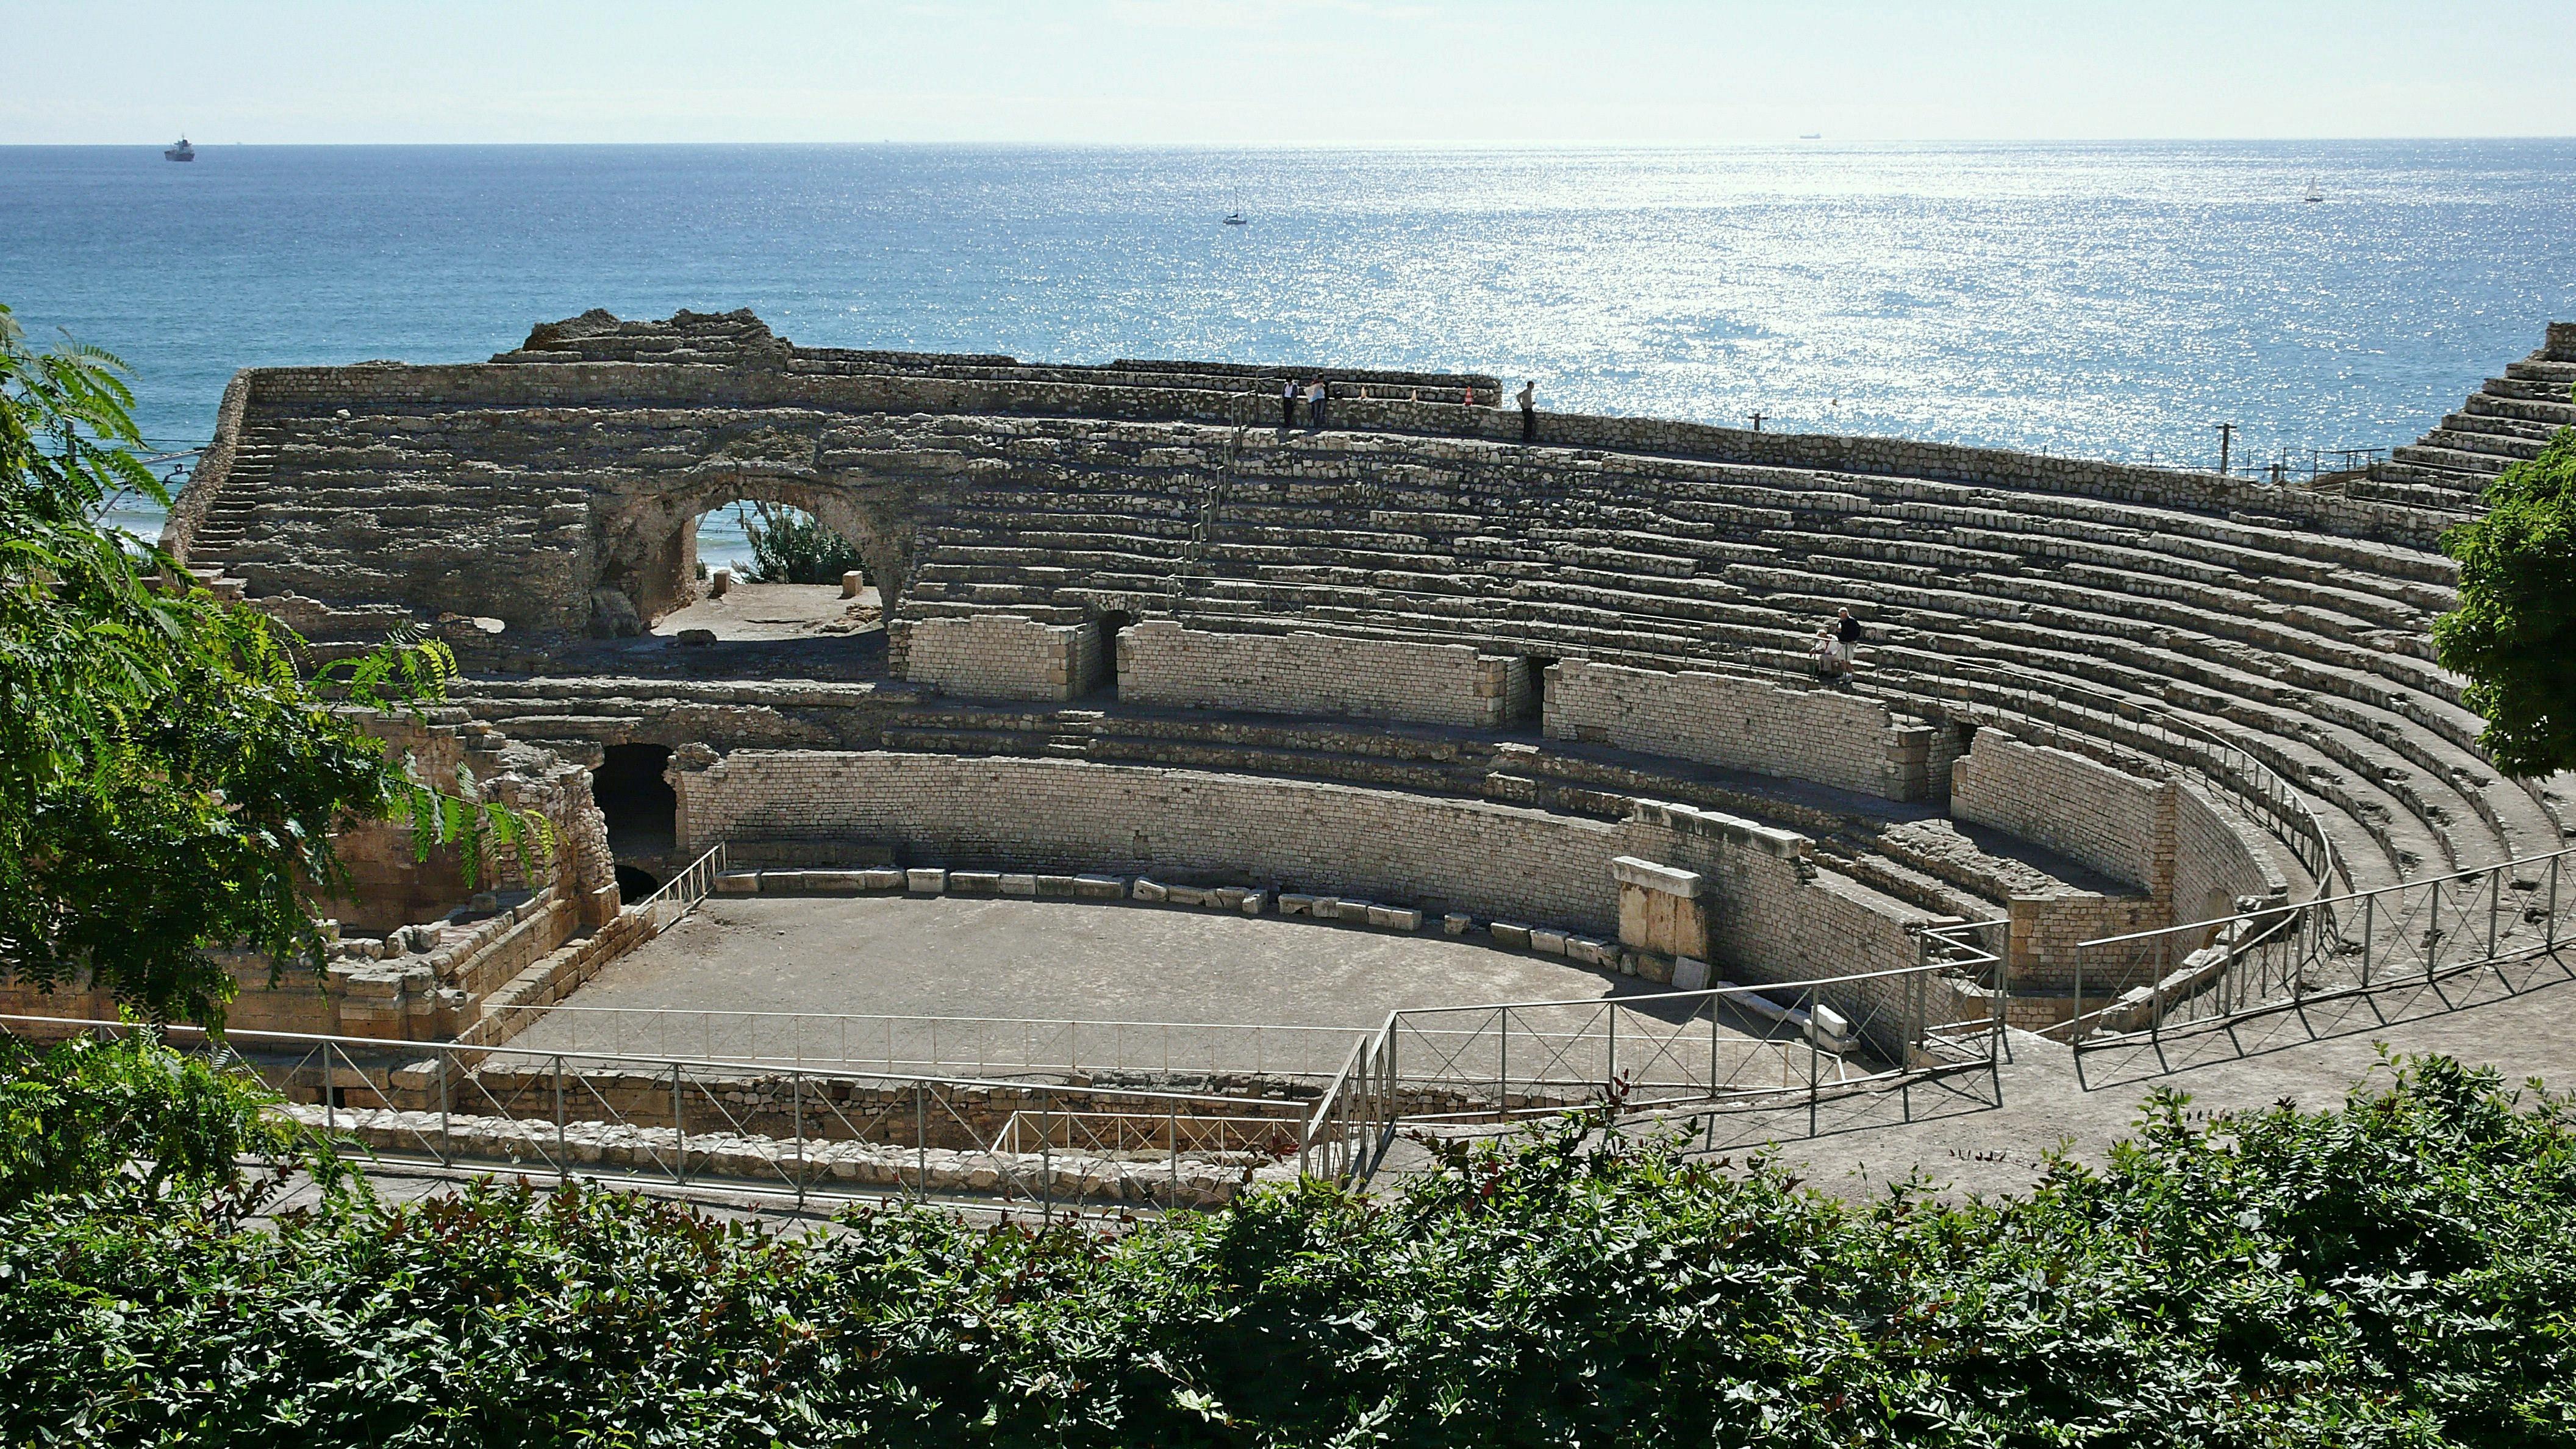 File:Anfiteatro romano-tarragona-2008 (3).JPG - Wikimedia Commons